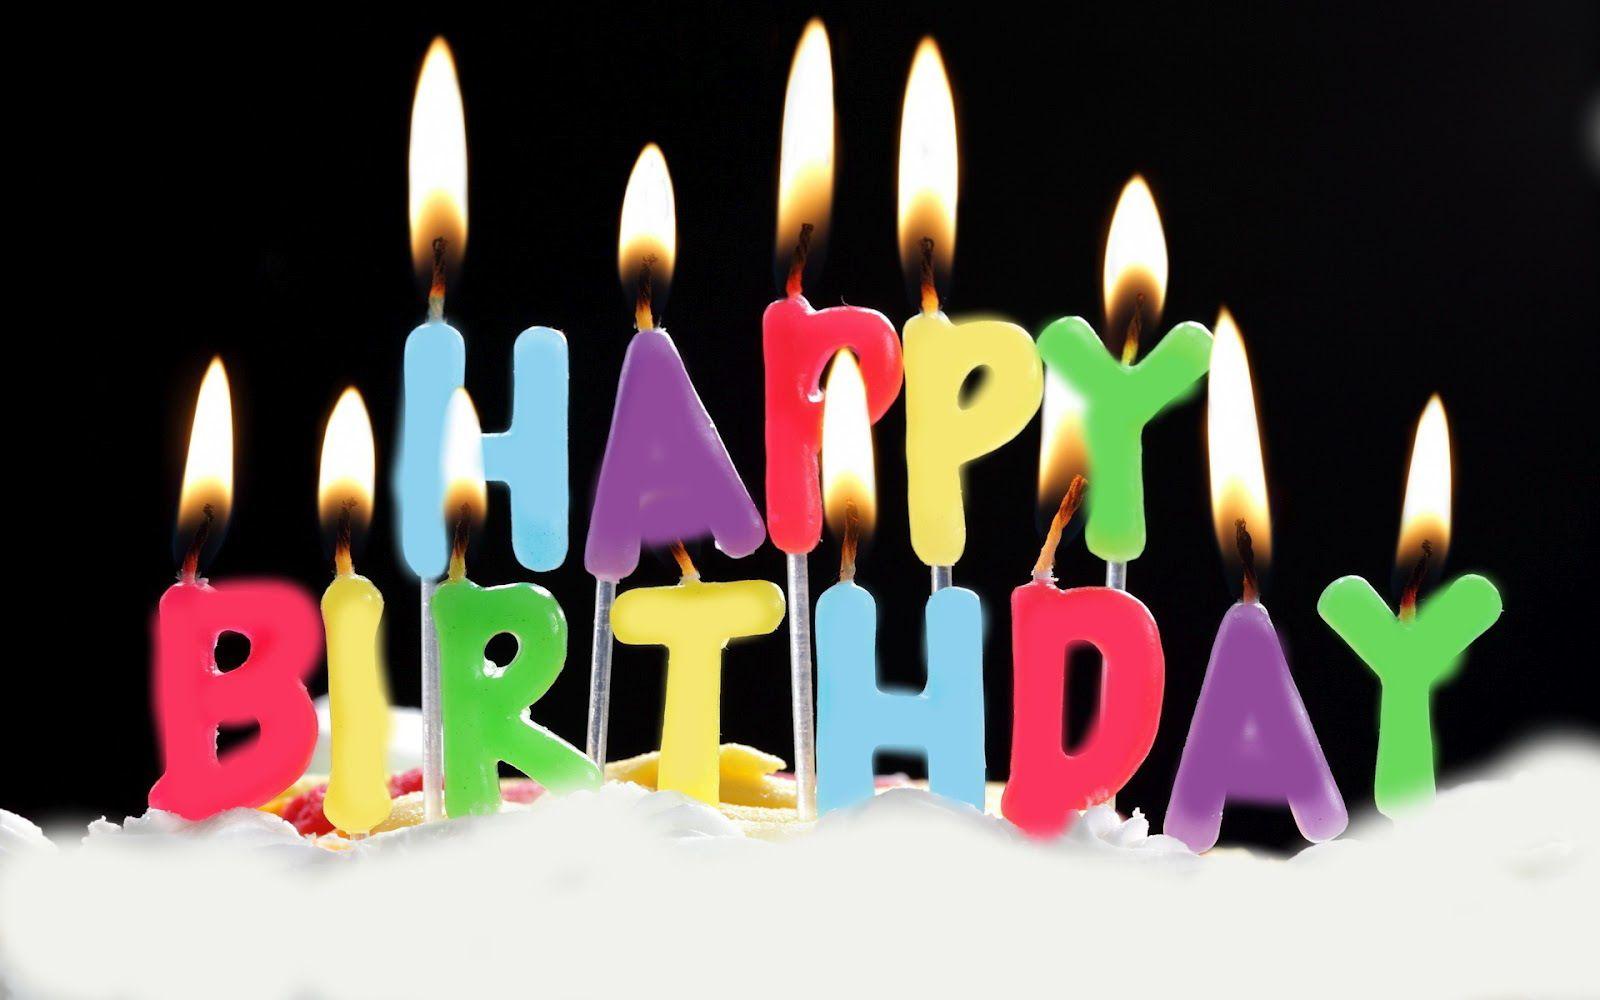 Birthday Cake Animated Gif Birthday Pinterest Animated Gif